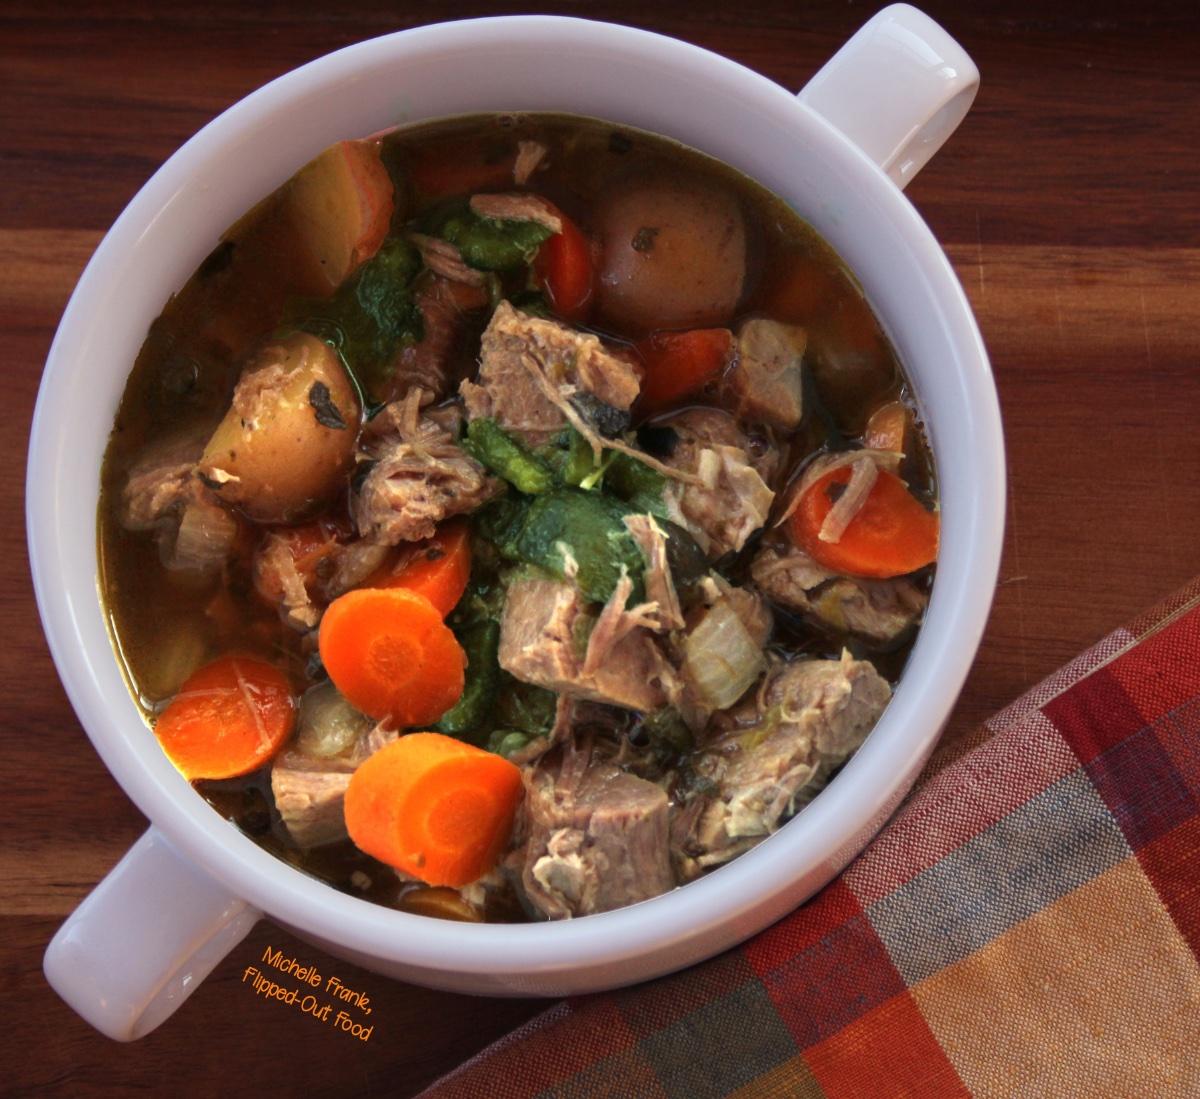 Caldillo: Green Chile Pork Stew in a 2-handled bowl.